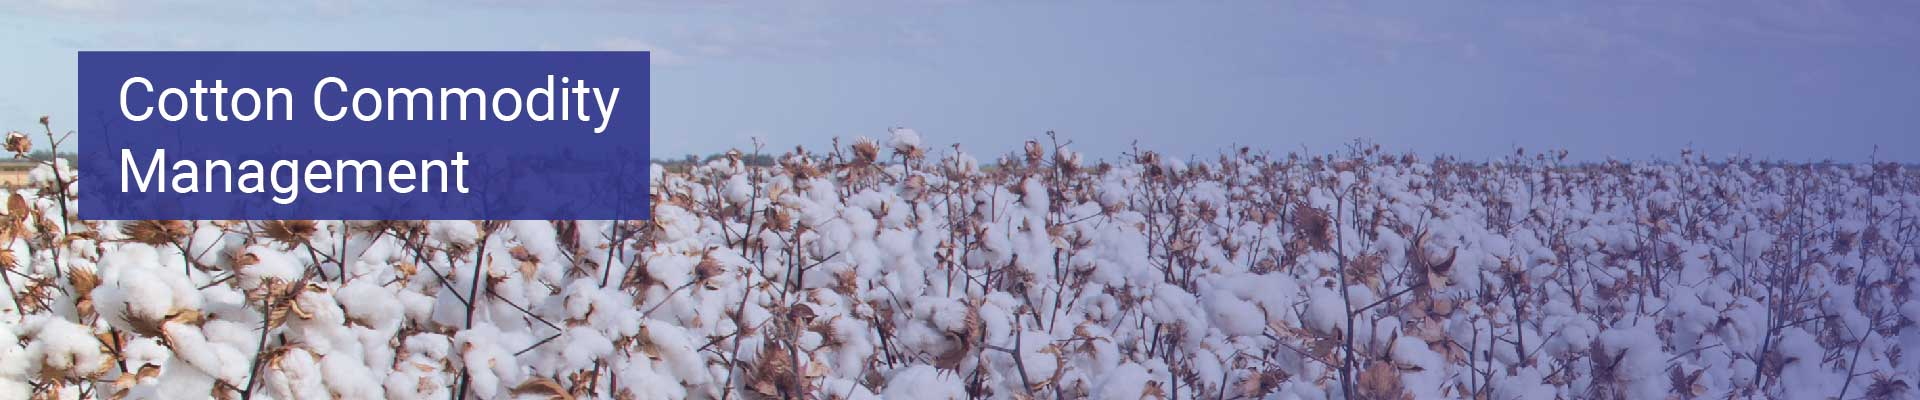 cotton ctrm banner-01